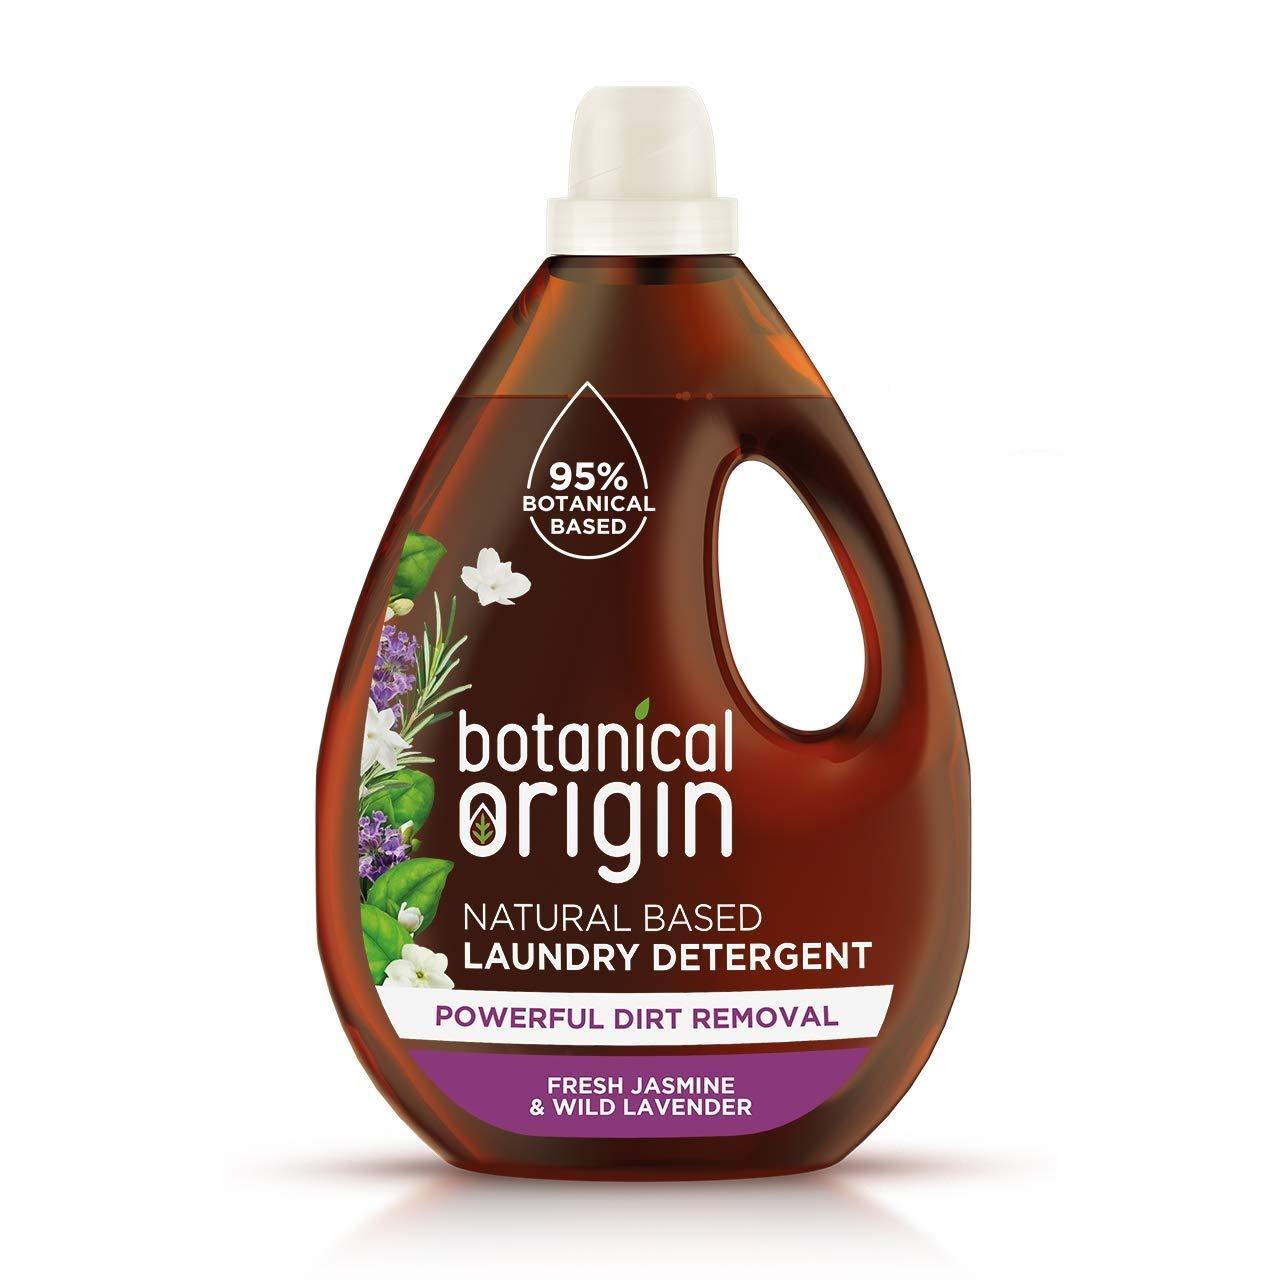 Botanical Origin Concentrated Eco Laundry Detergent, Fresh Jasmine & Lavender, 1.6 L £9.50 + £4.49 NP @ Amazon